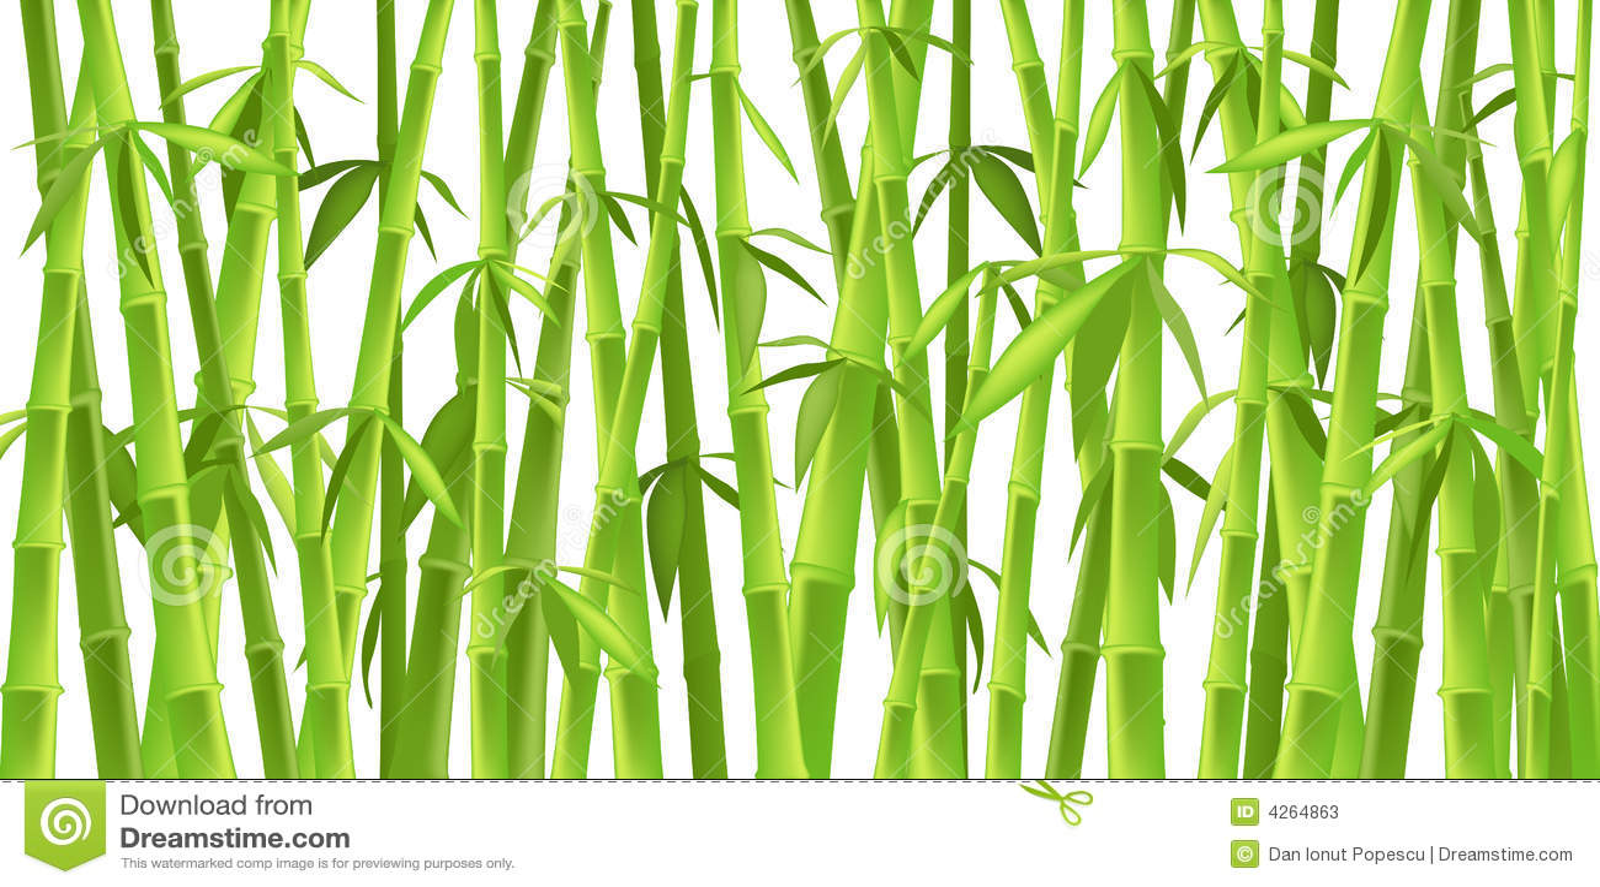 arbres en bambou chinois illustration de vecteur image du d coration 4264863. Black Bedroom Furniture Sets. Home Design Ideas